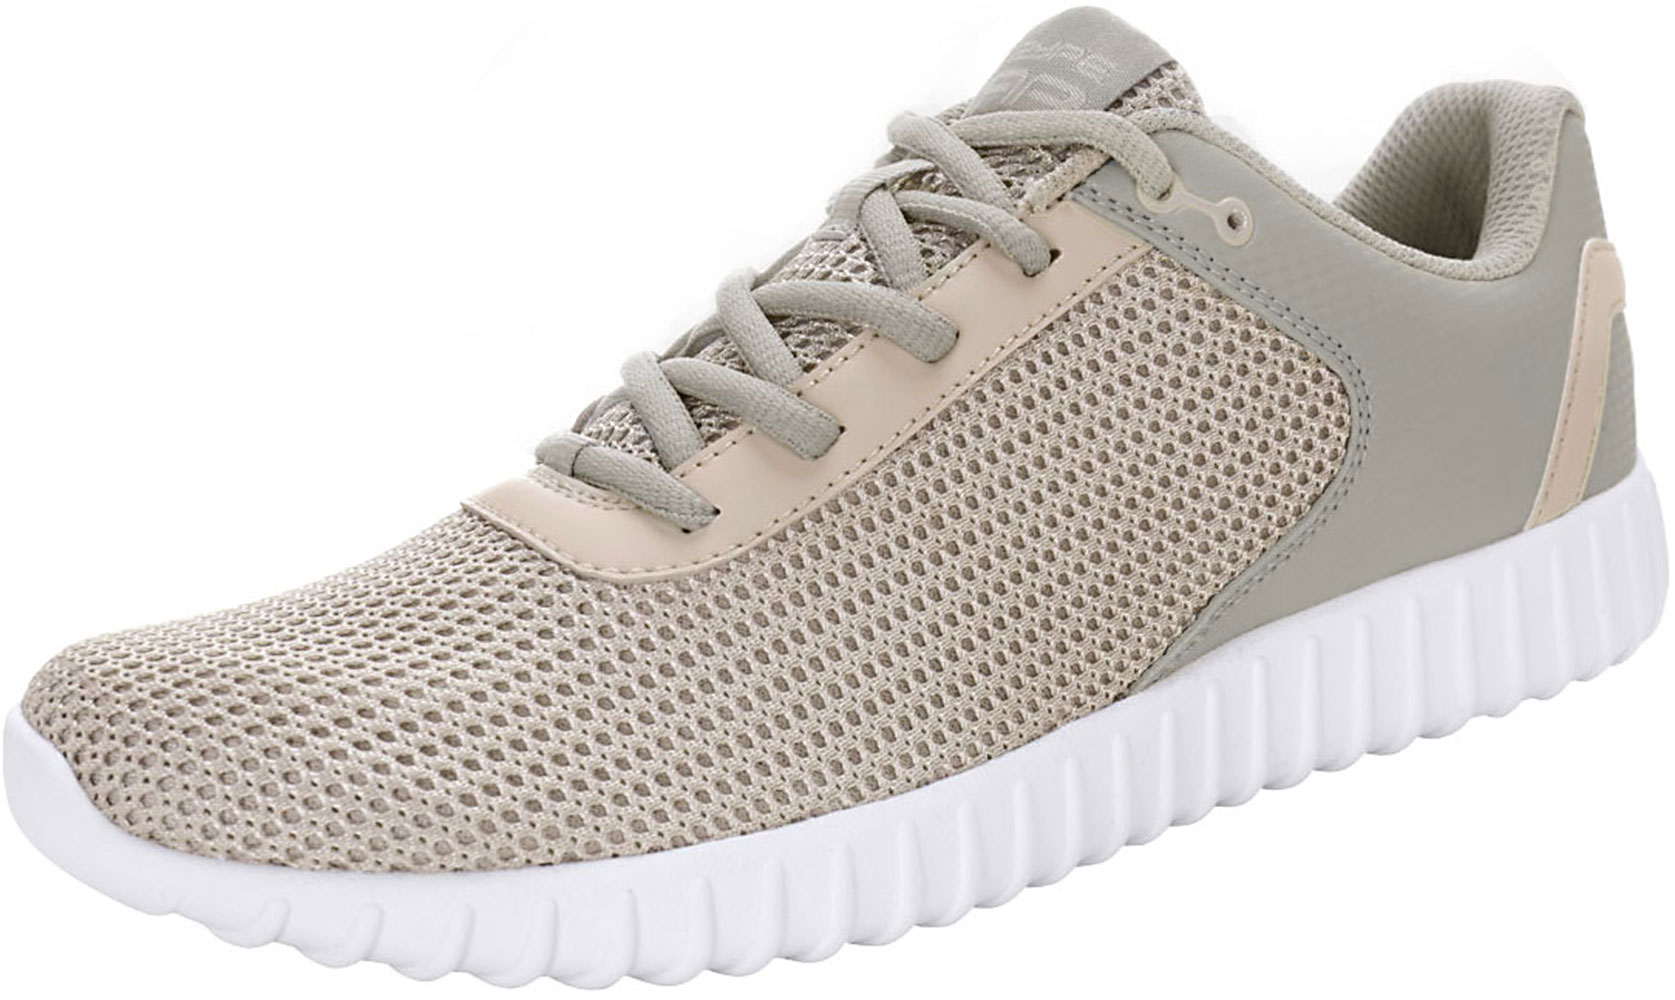 PYPE Women Contrast Color PU Panel Mesh Training Shoes Gray US 8.5